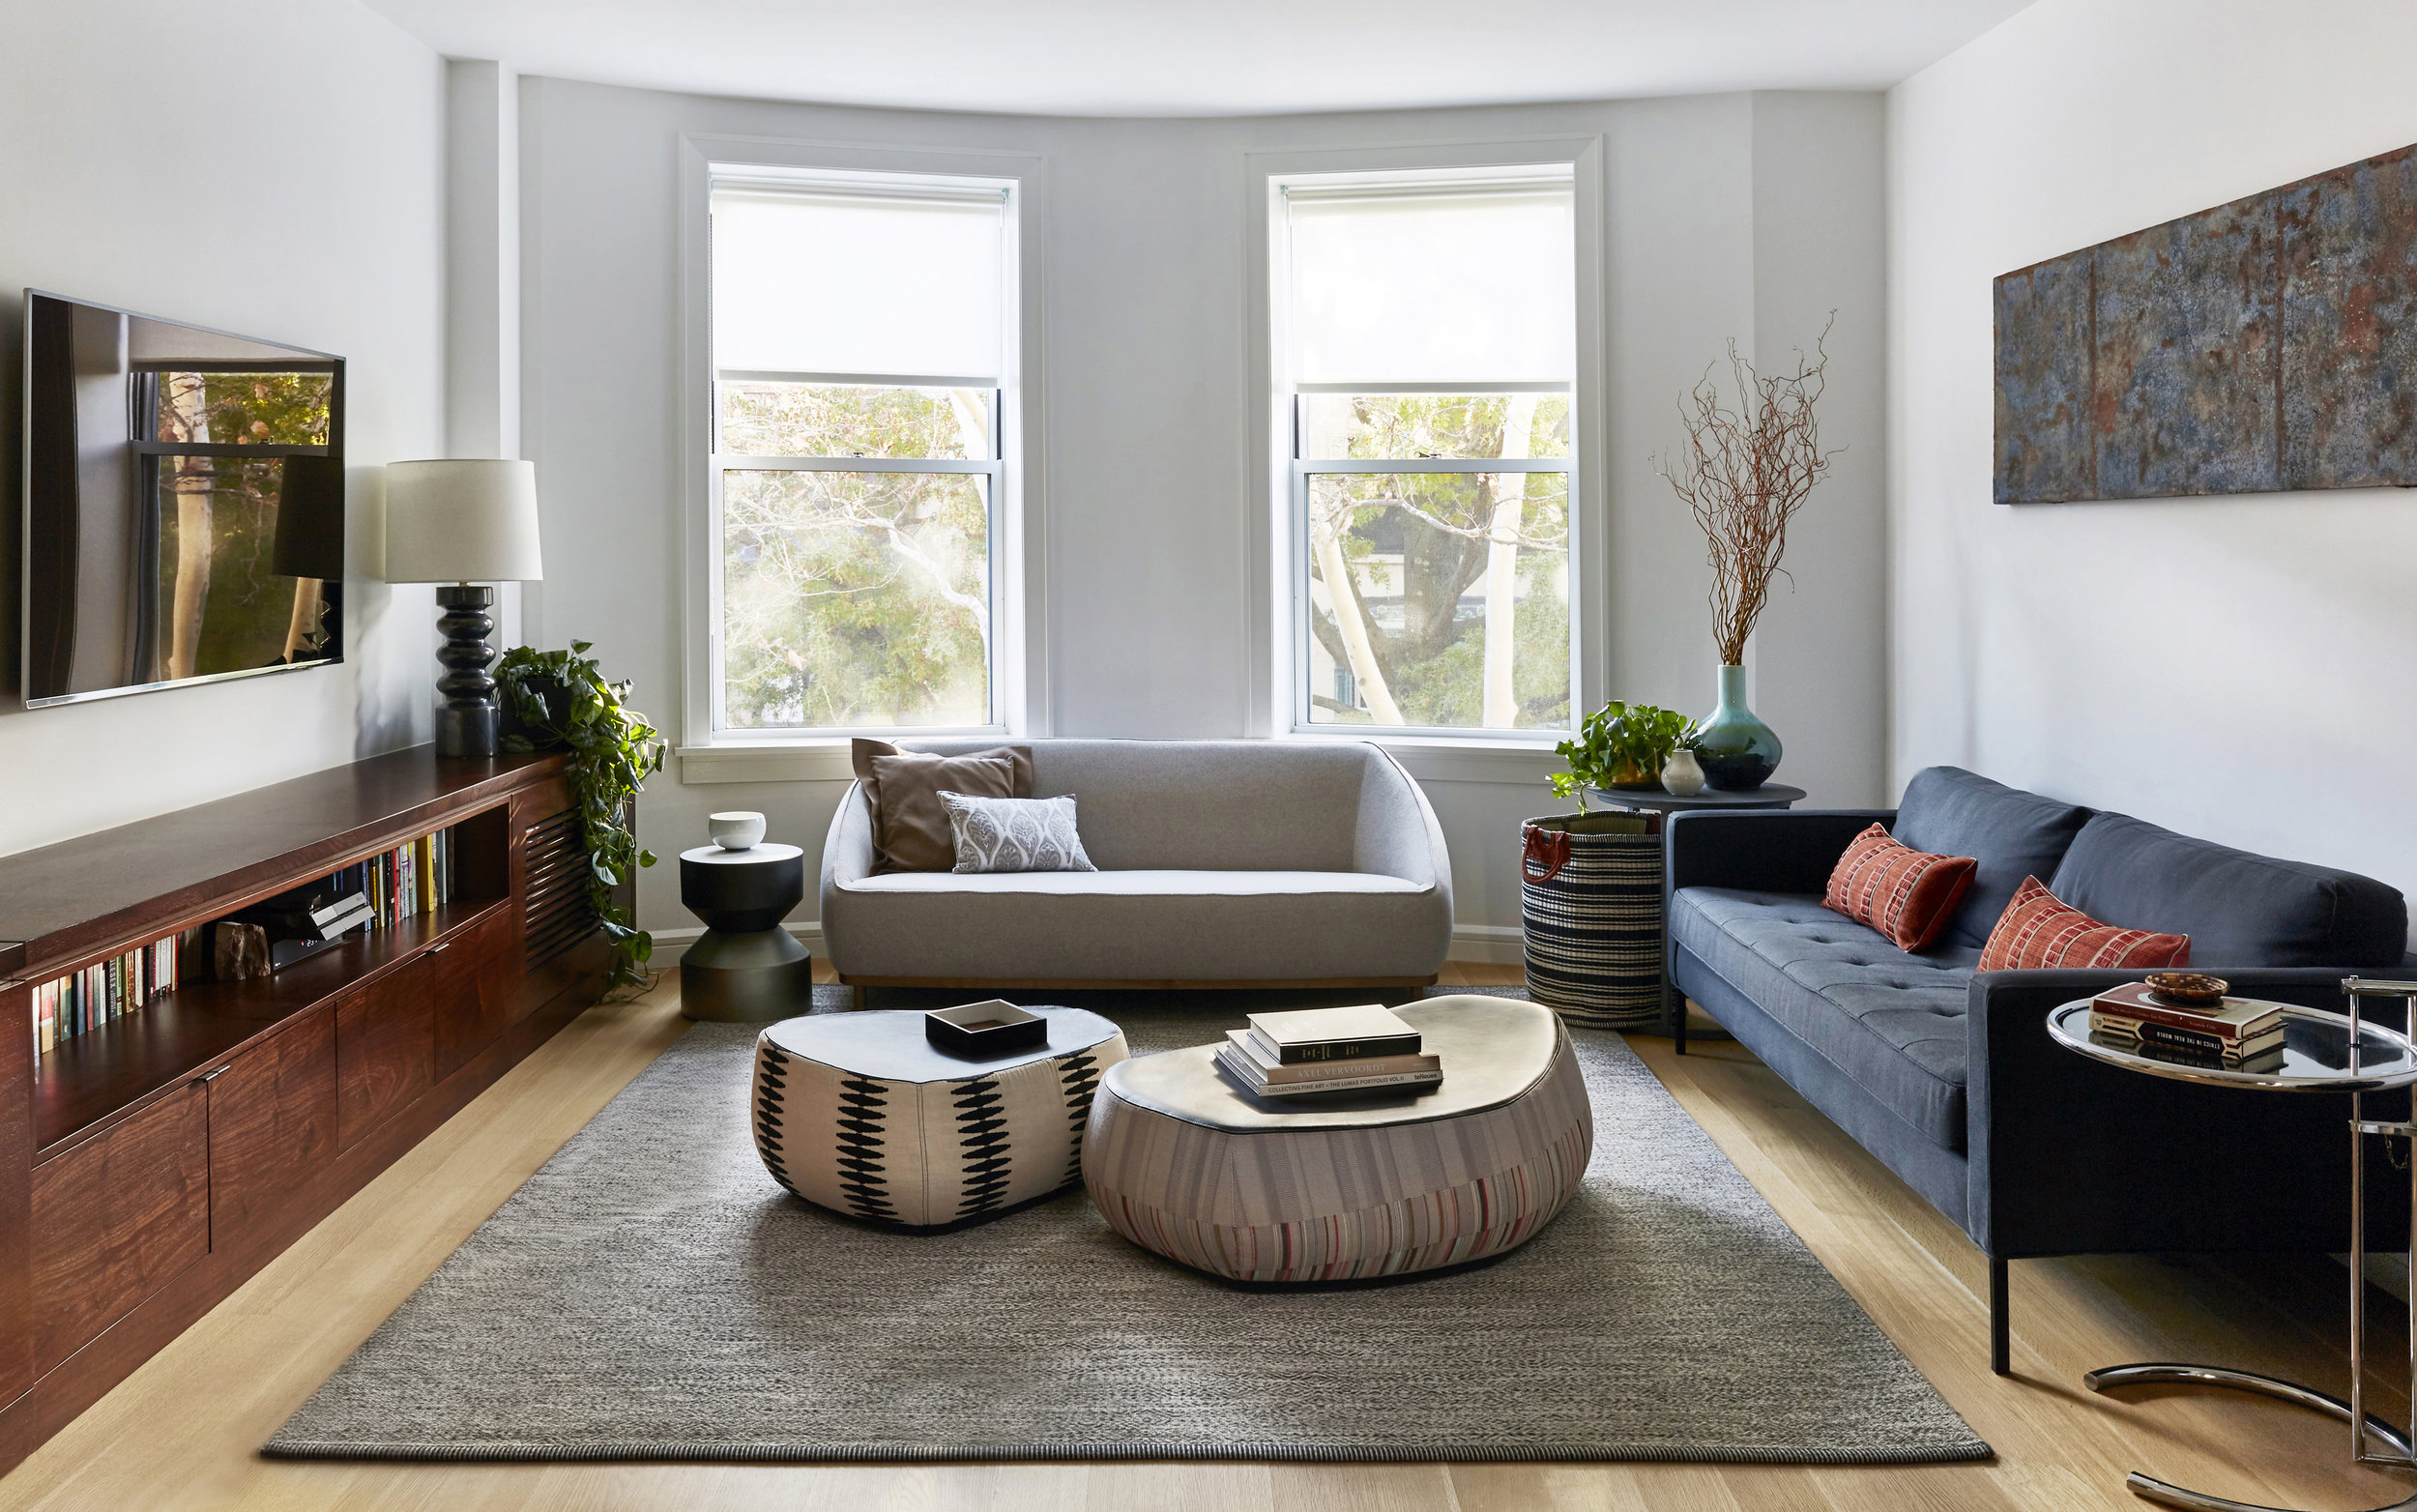 Cozy modern living room moroso pouf kasthall rug jmorris design interior designer brooklyn jpg